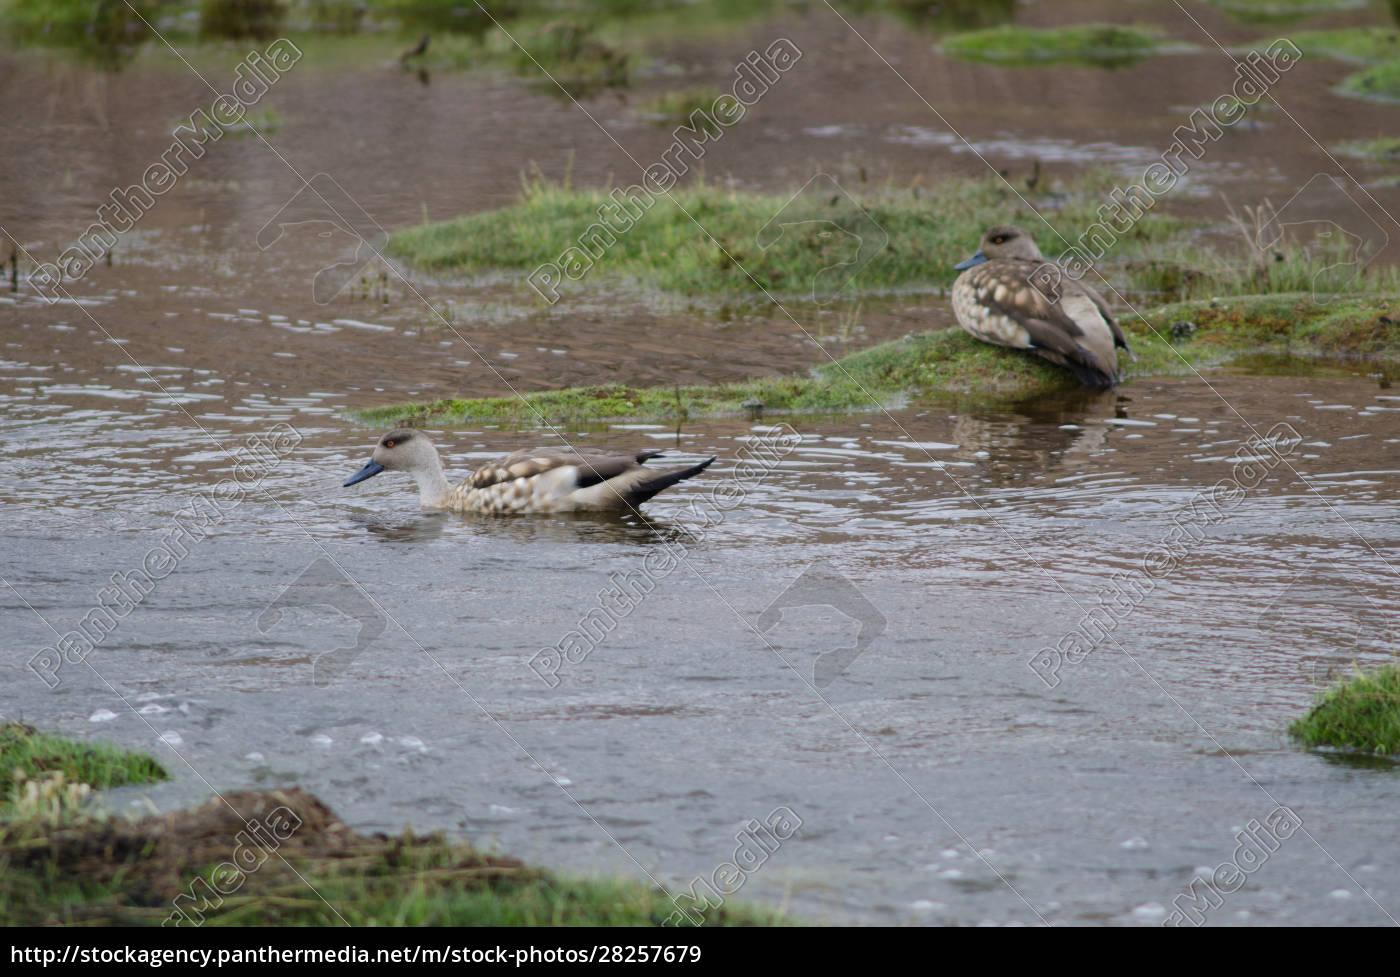 andean, crested, ducks, lophonetta, specularioides, alticola - 28257679